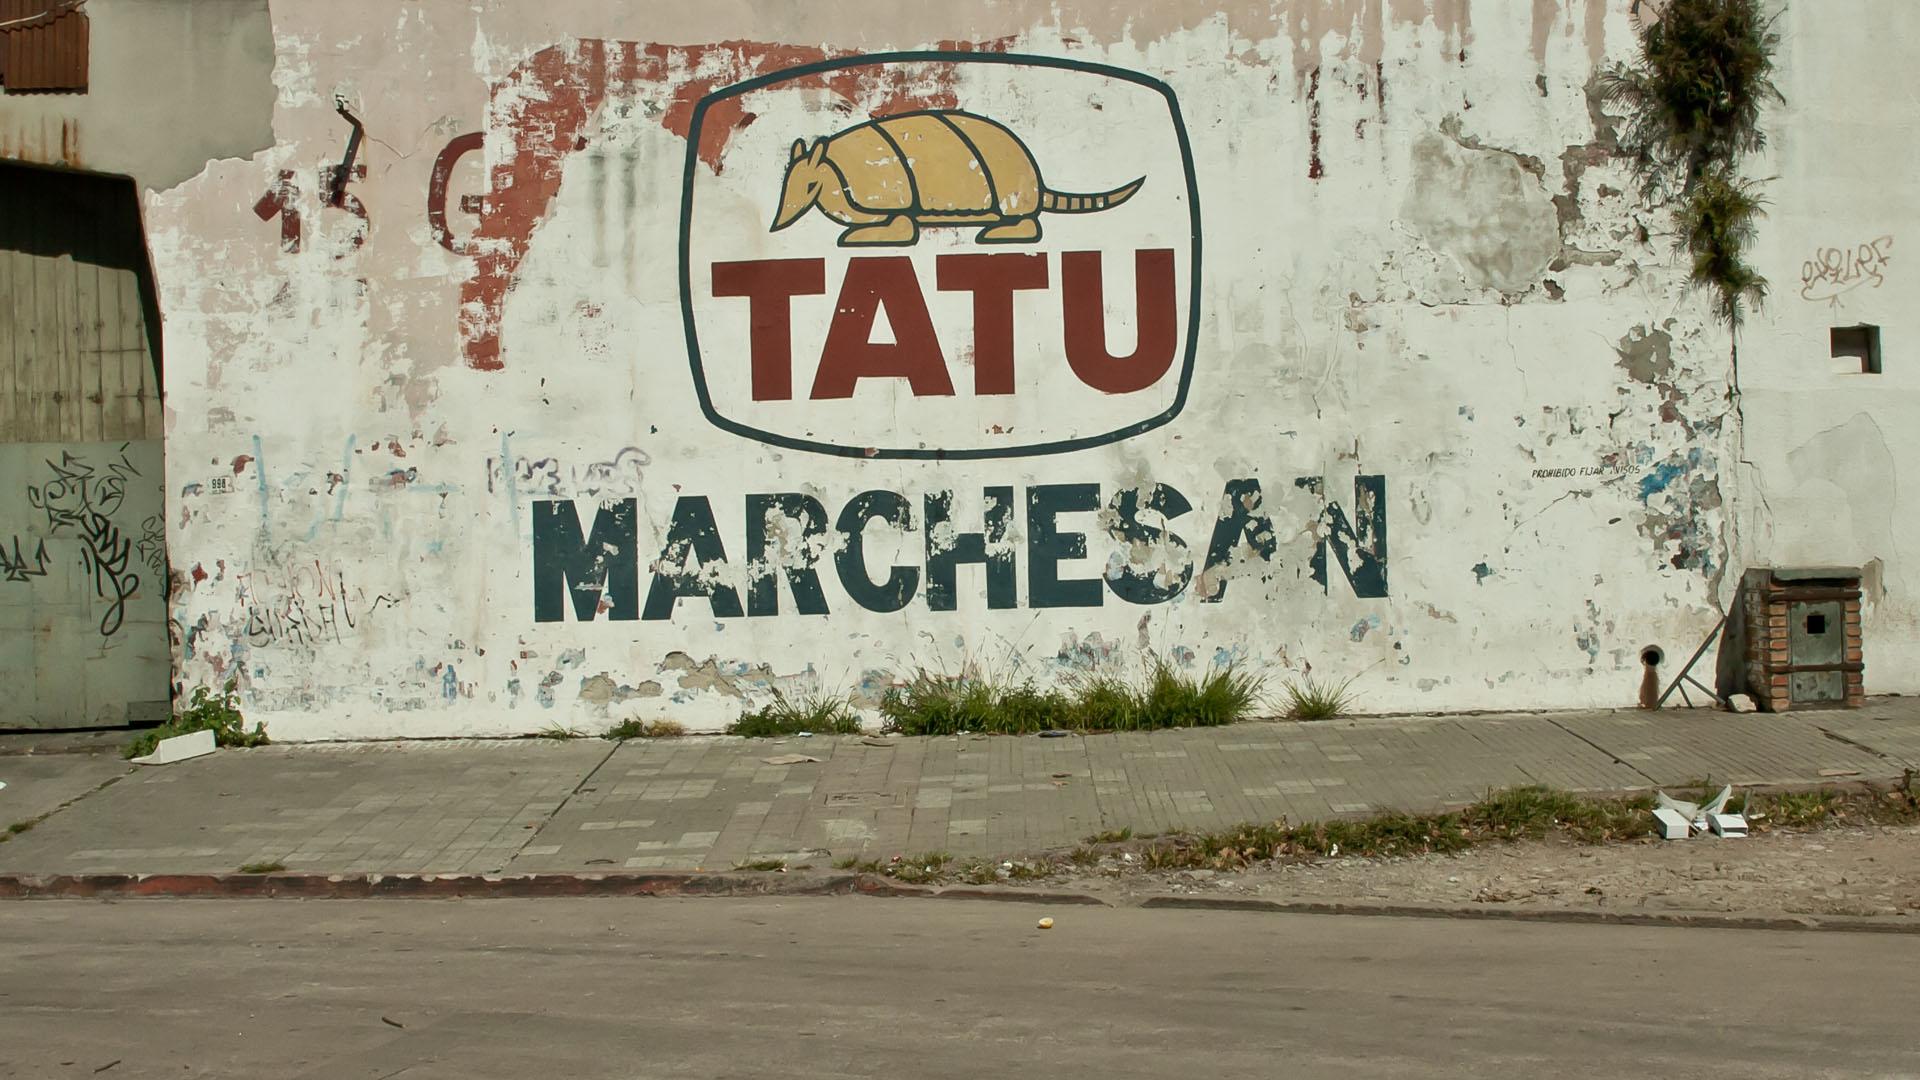 Uruguay_0006s_0006_5